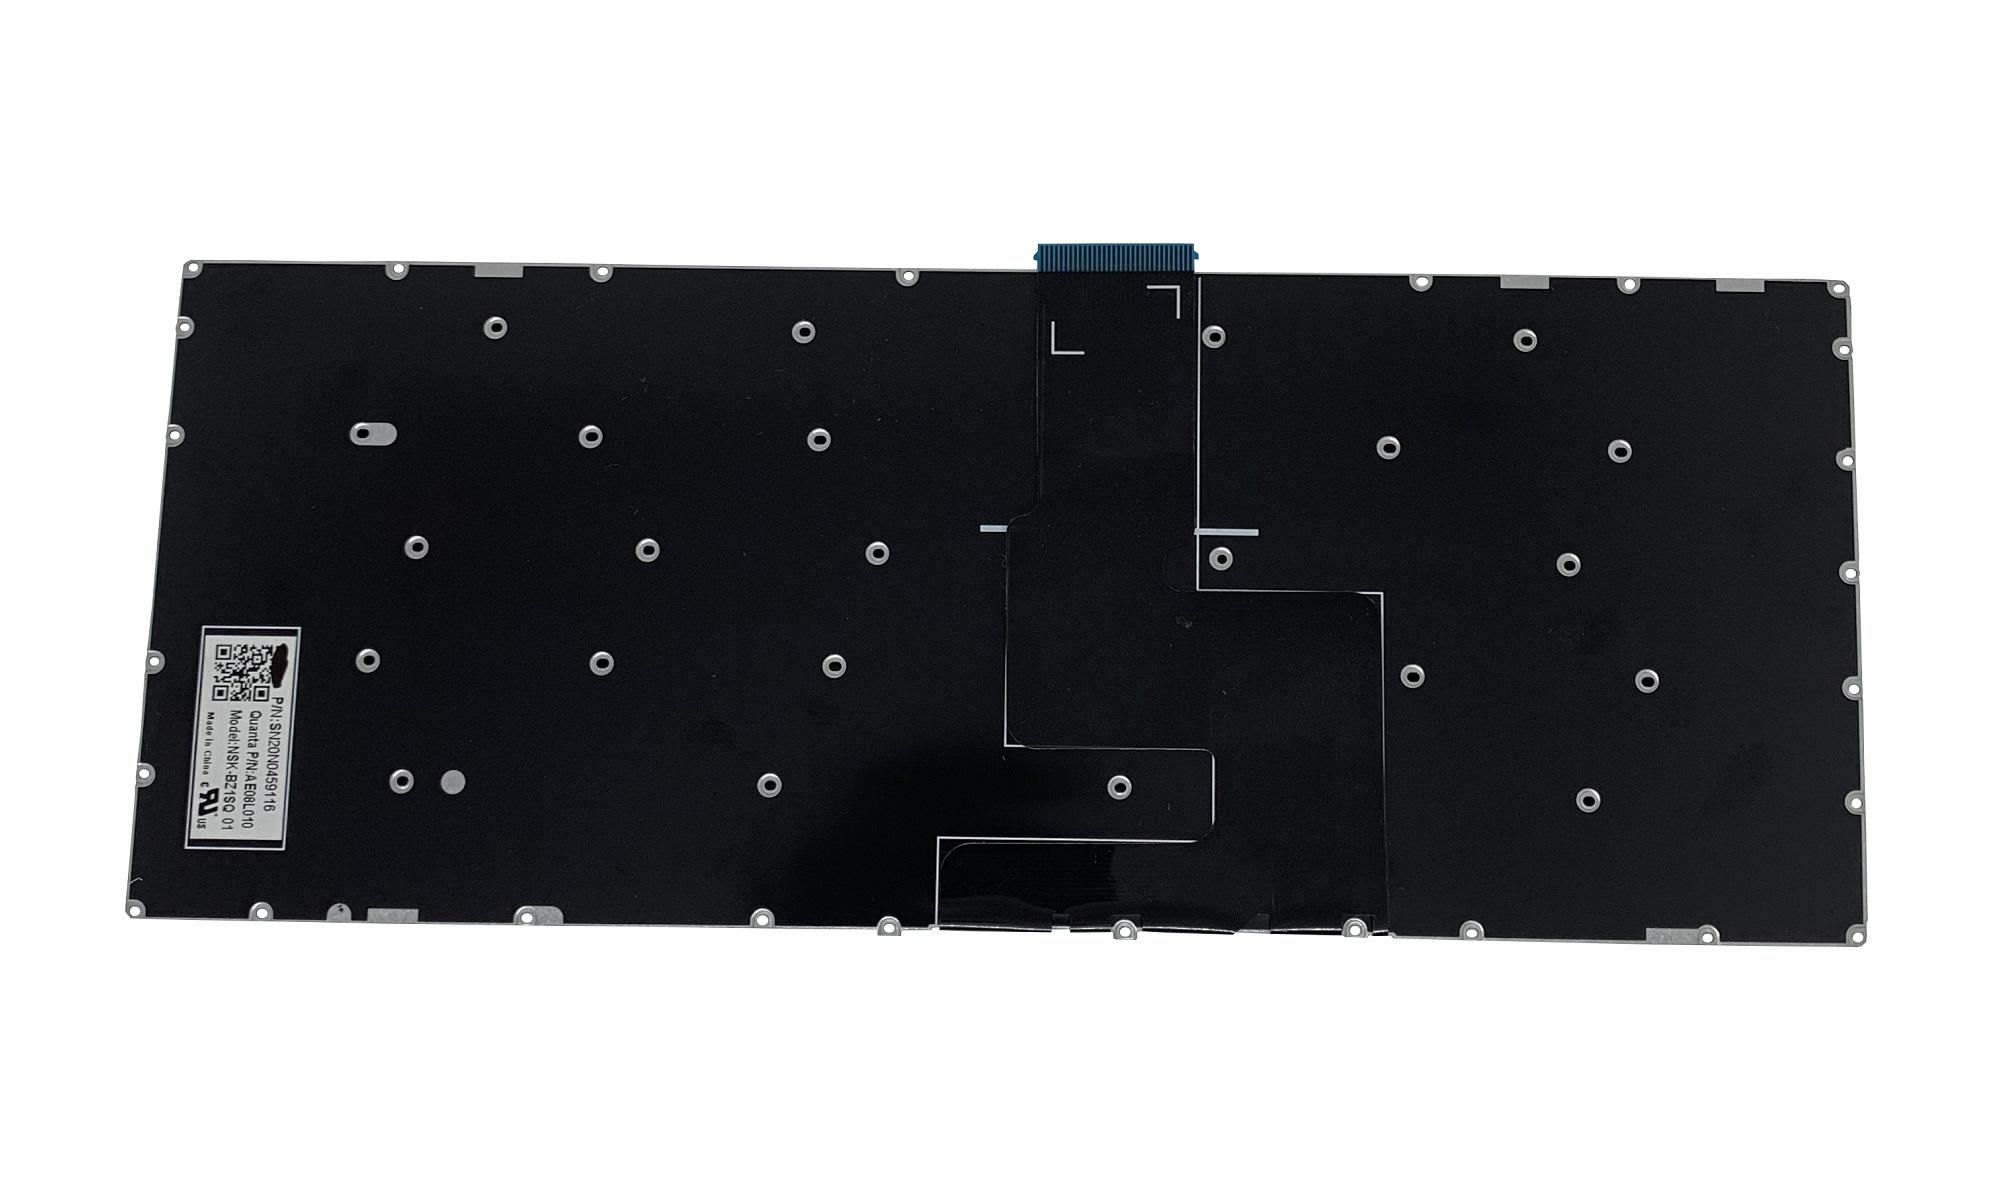 Tastatura compatibila Lenovo IdeaPad 330S-14AST TYPE 81F8, fara iluminare, layout US